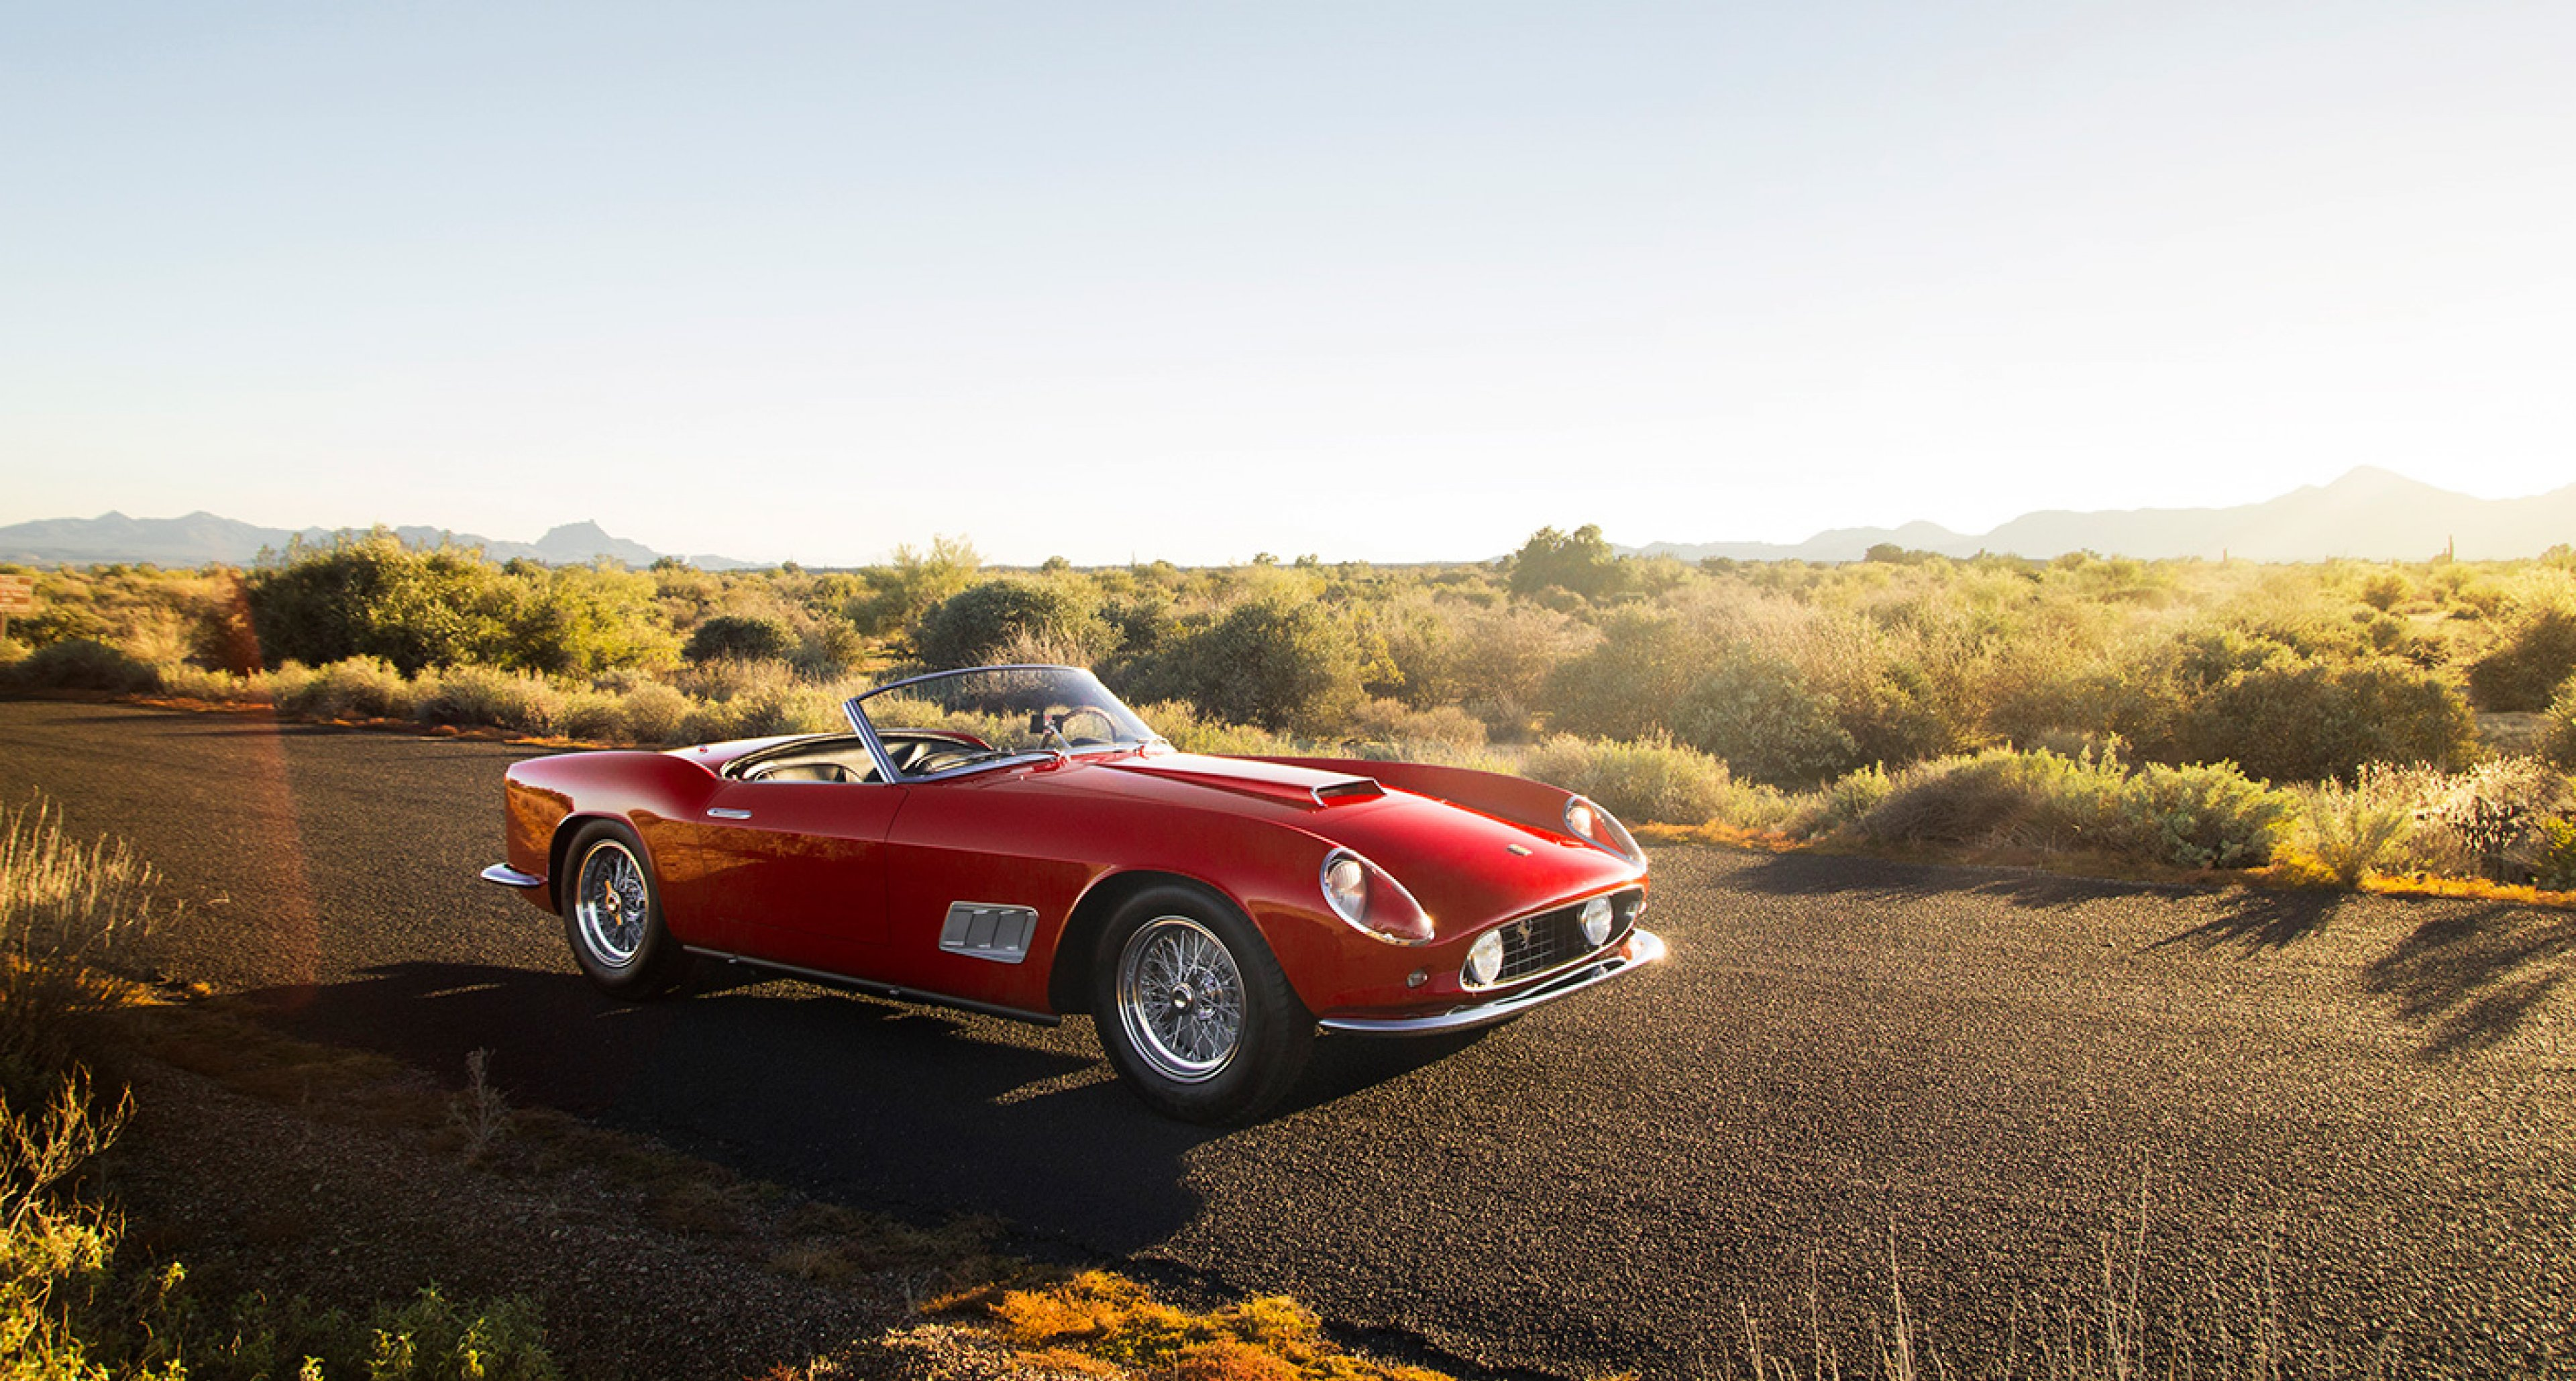 1958 Ferrari 250 GT LWB California Spider sold by RM for $8,800,000